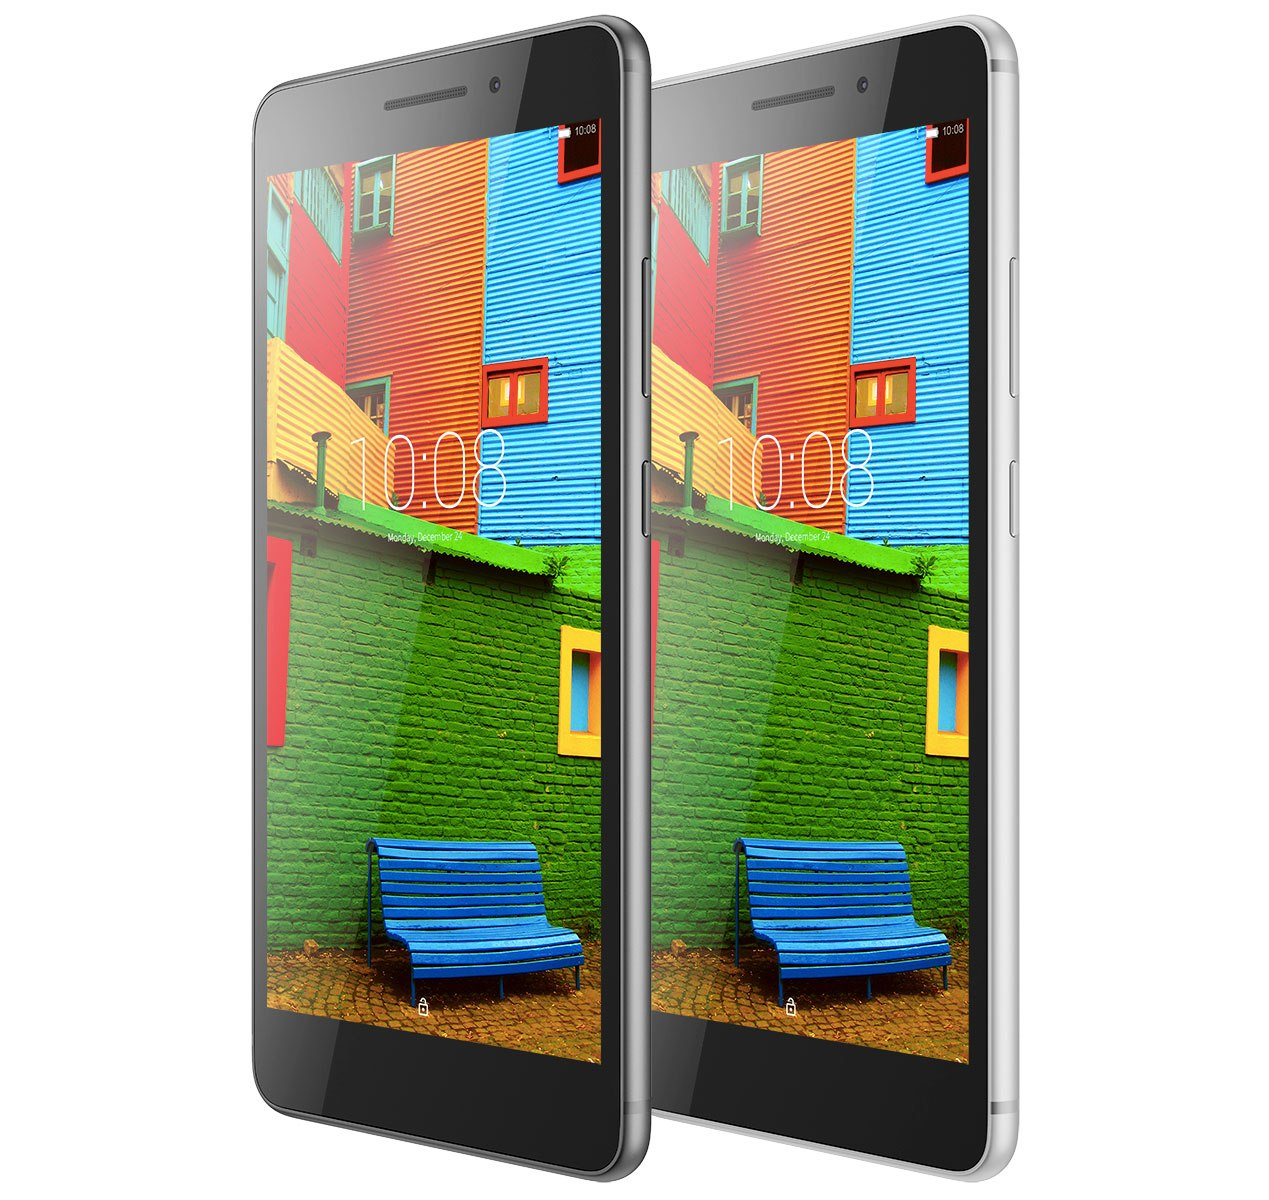 Lenovo Phab Plus, presque une tablette